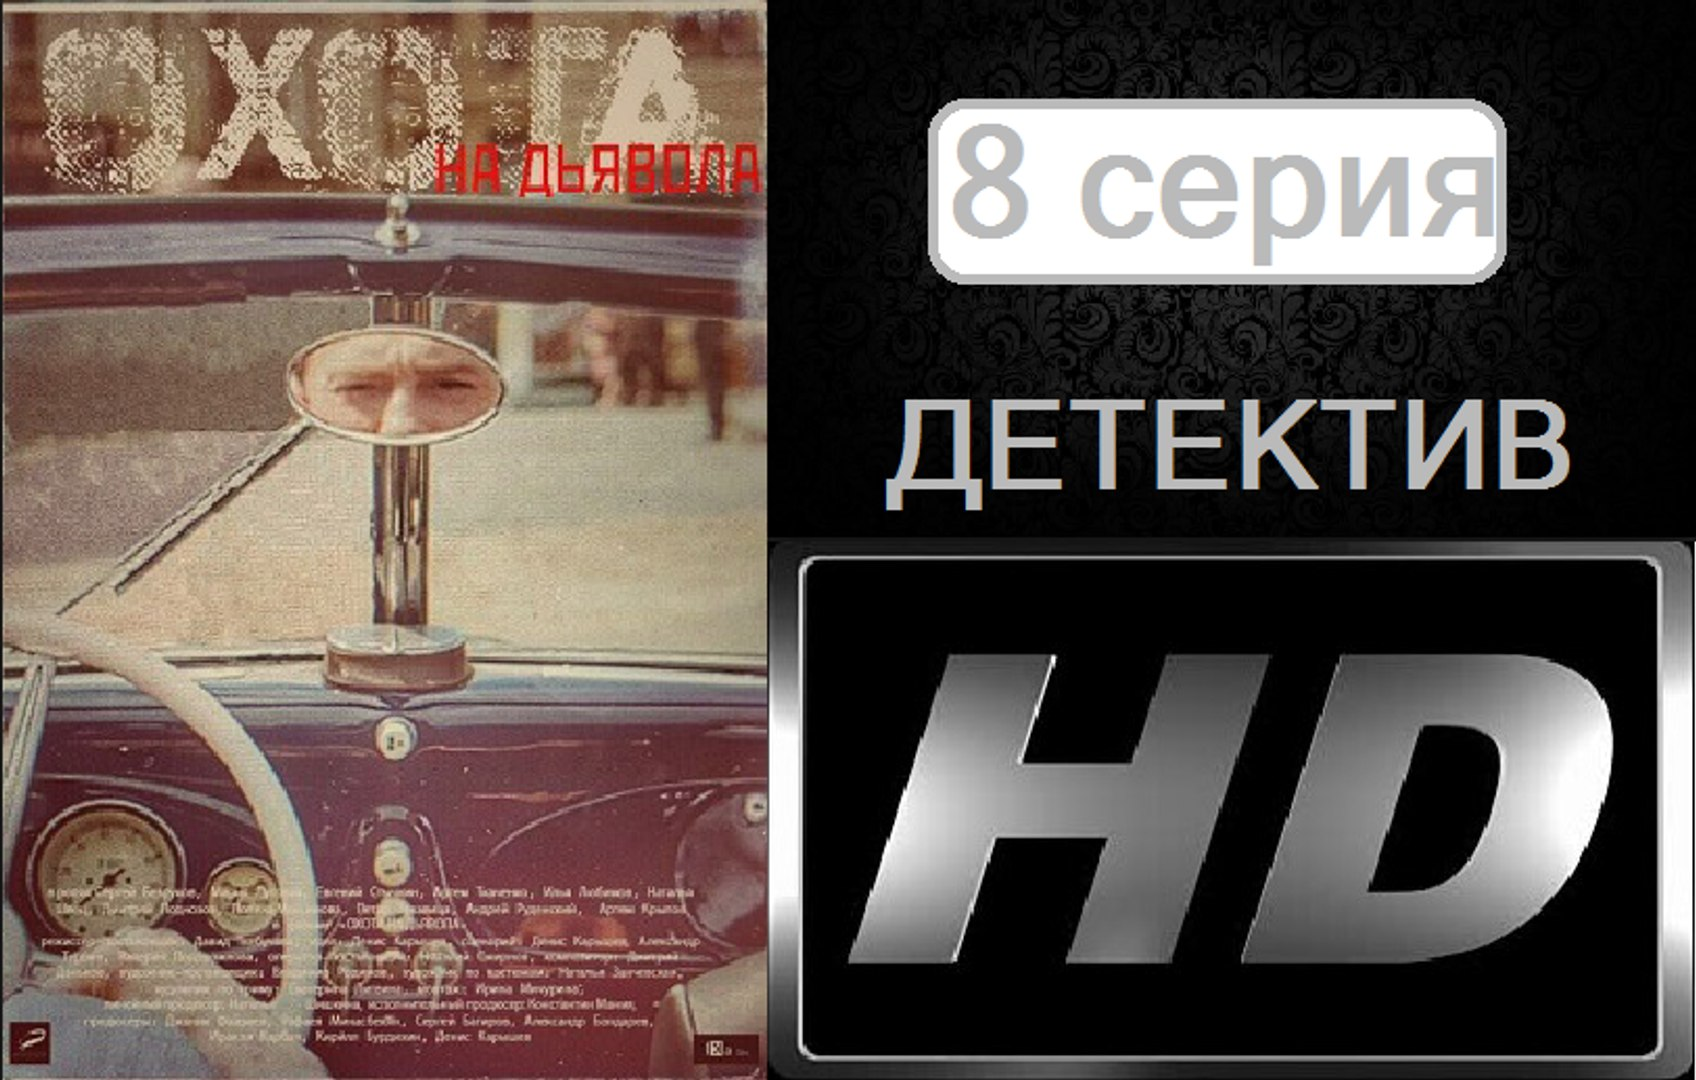 Охота на Дьявола 8 серия. Сериал (2017). Шпионский Детектив